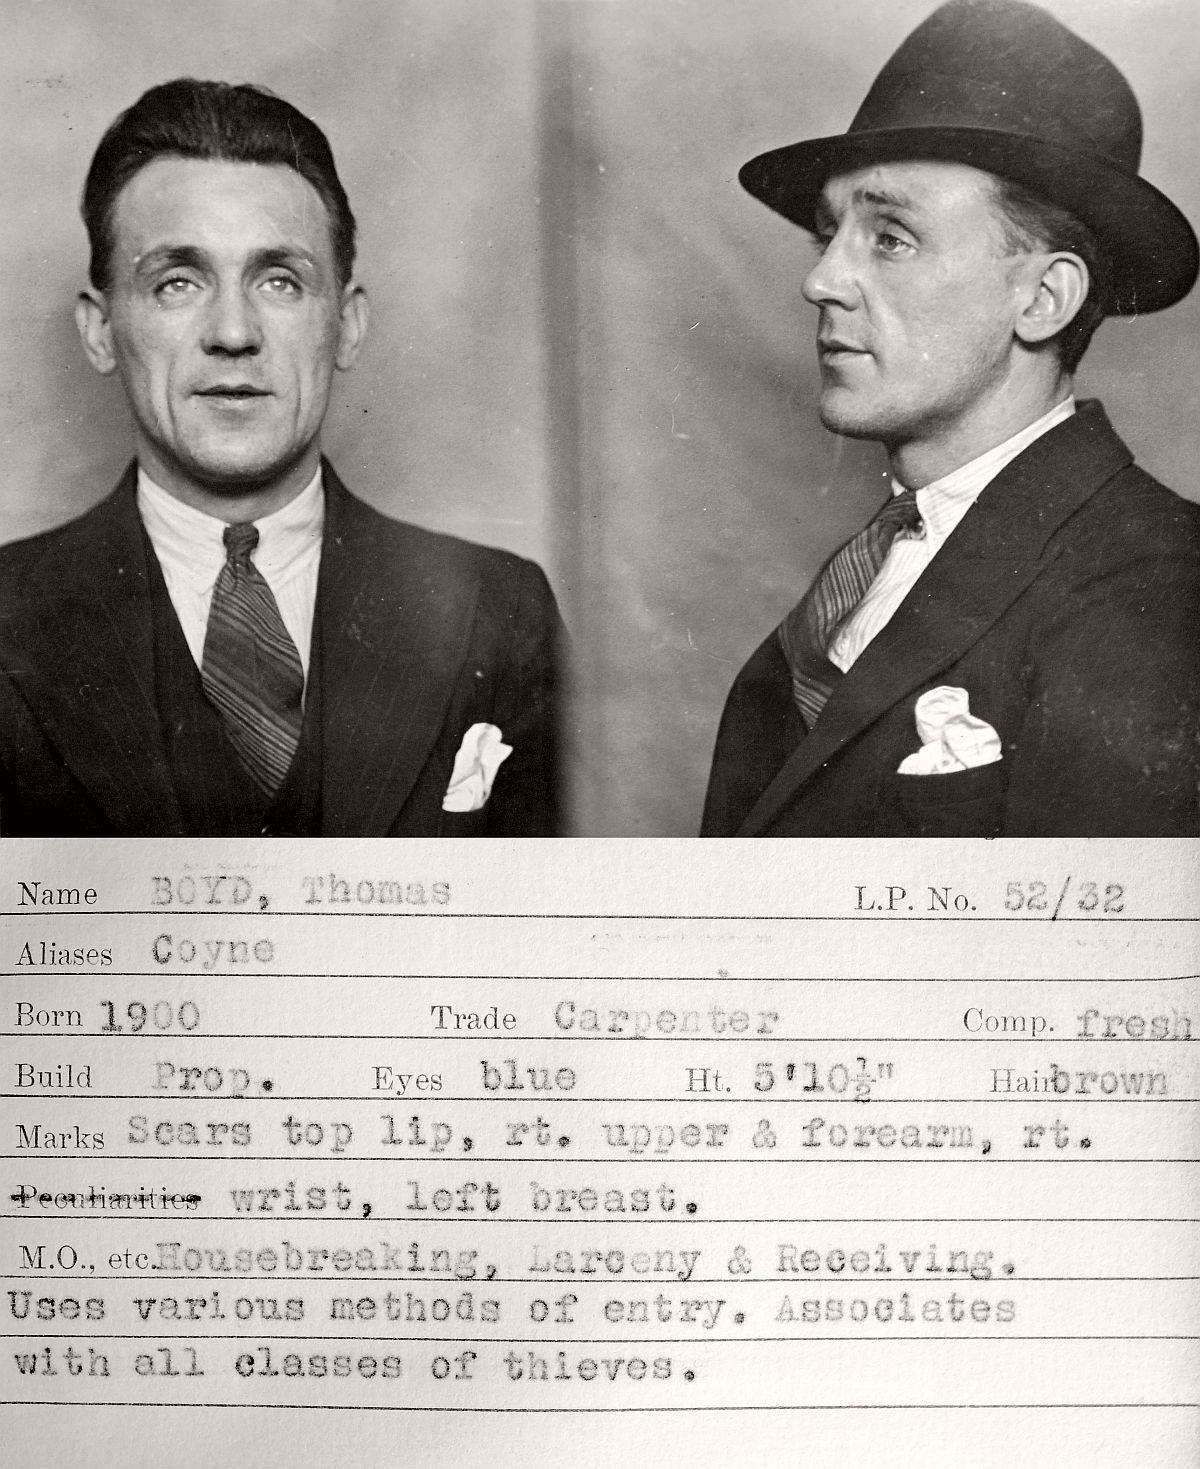 vintage-mug-shot-of-criminals-from-newcastle-upon-tyne-1930s-16